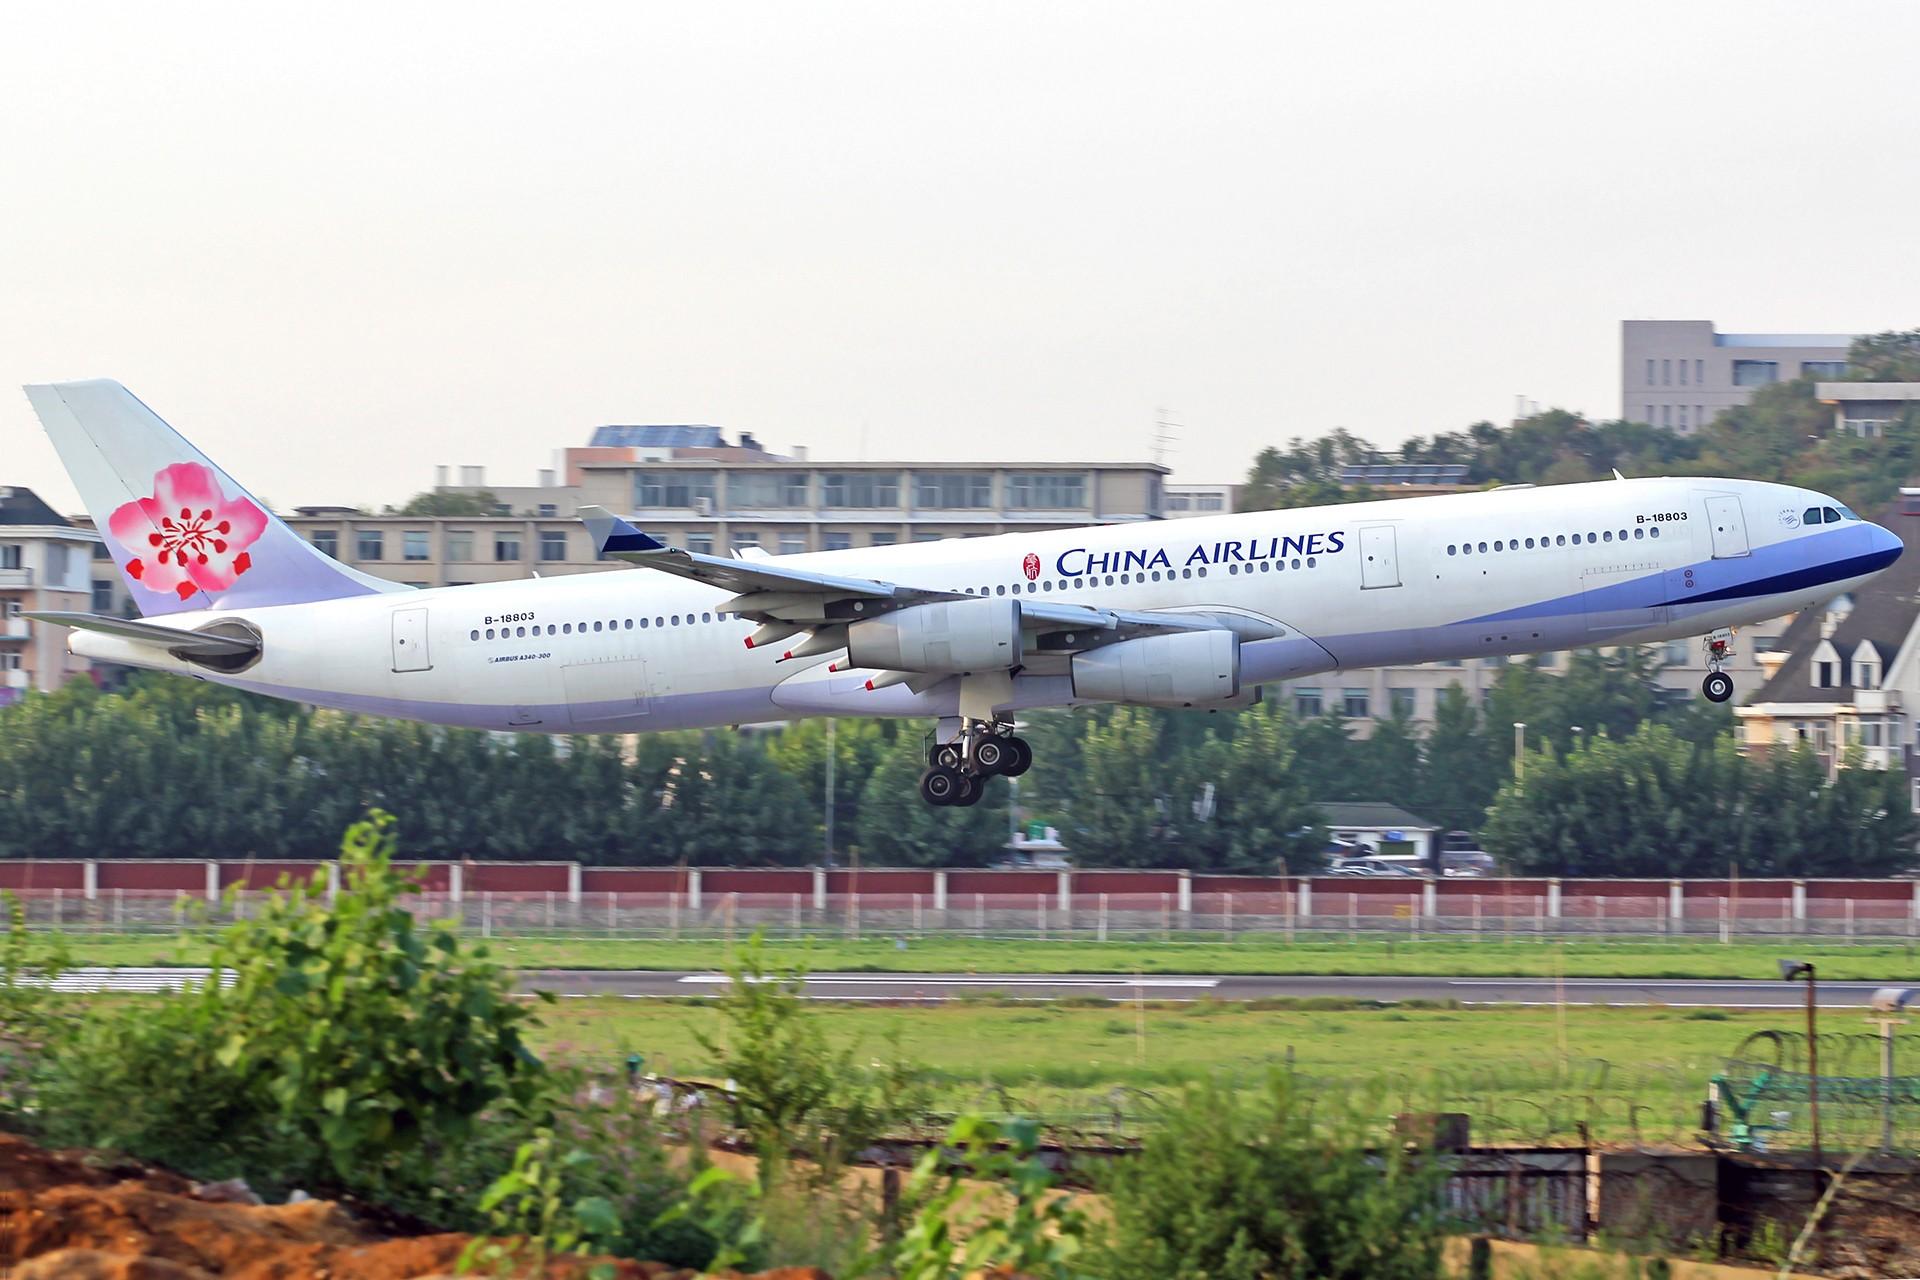 Re:[原创][DLC]。。。皇军与美女。。。 AIRBUS A340-300 B-18803 中国大连国际机场